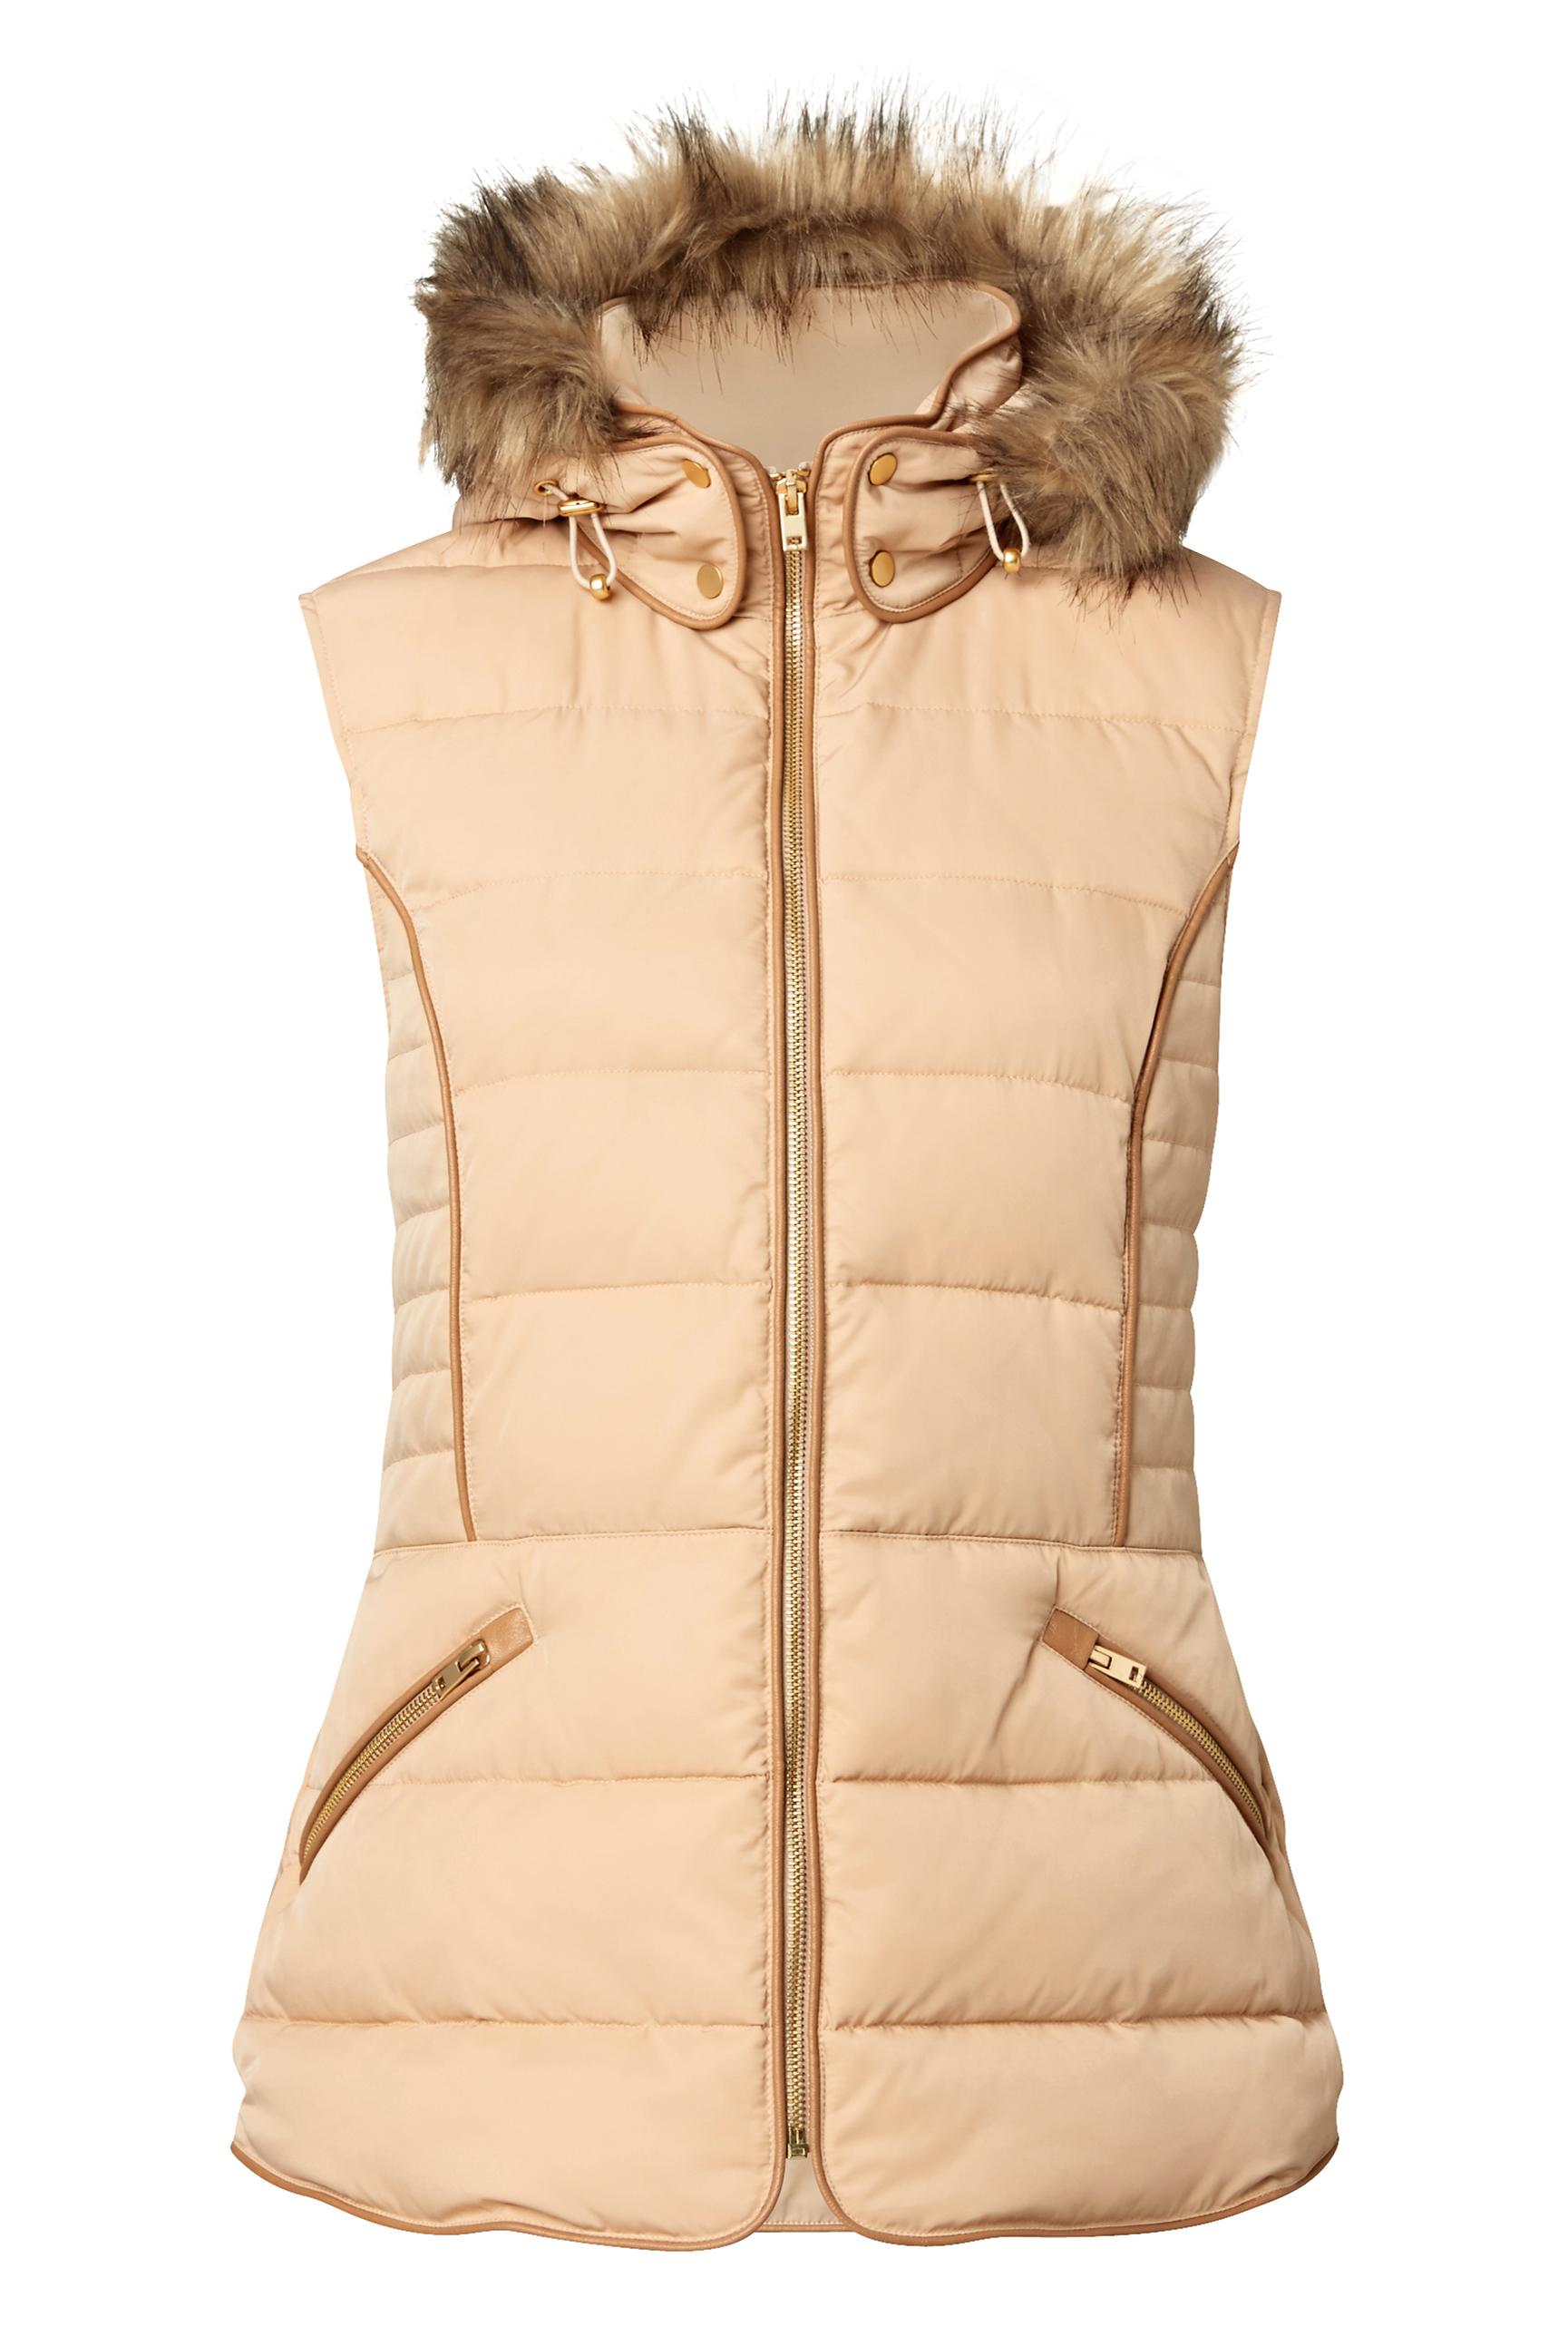 60193699_Witchery Fashion Puffer, RRP$199.90